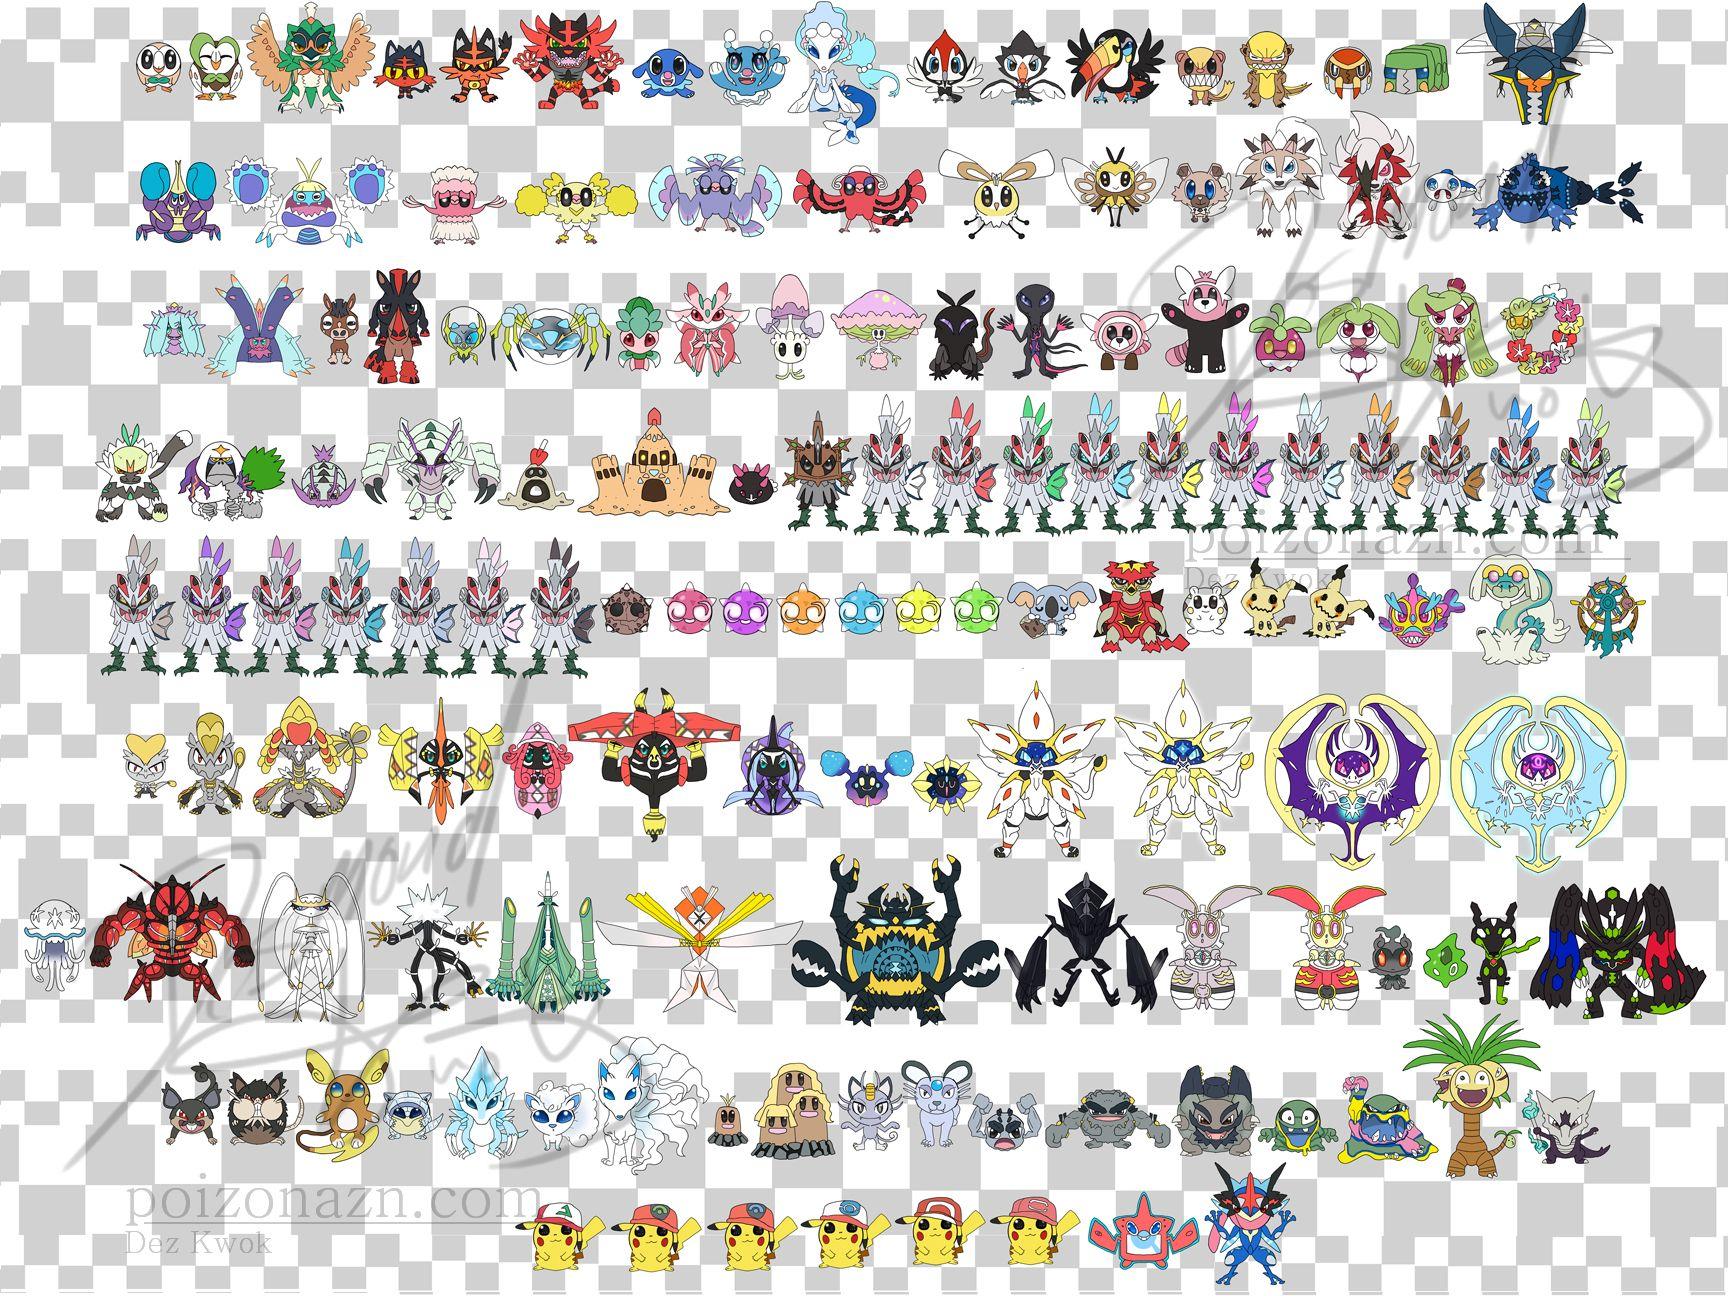 Roblox Pokerap The Random Adventures Of Pokemon Characters The Chus Ark Episode Iv Wattpad